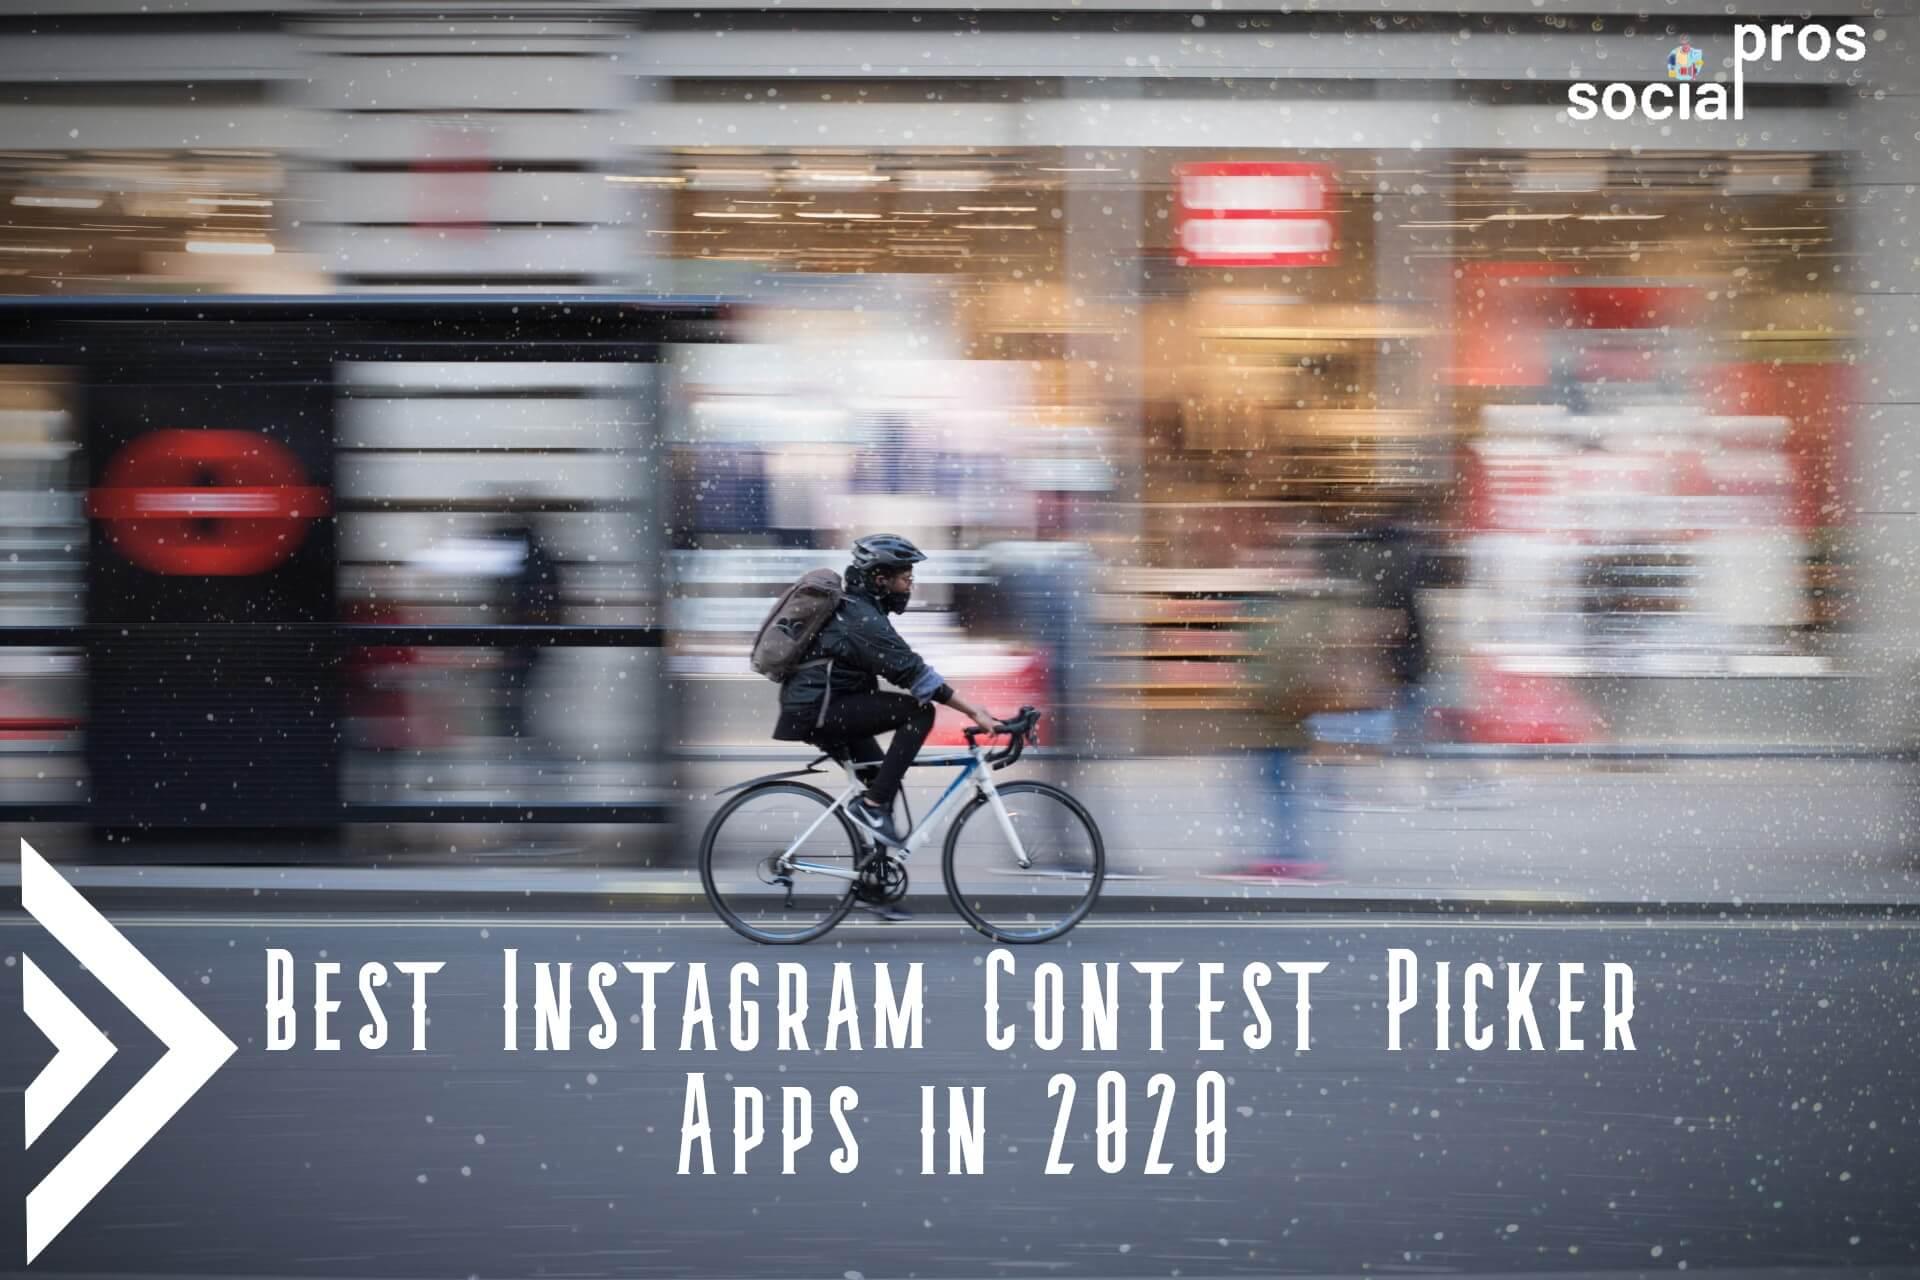 Best Instagram Contest Picker Apps in 2020